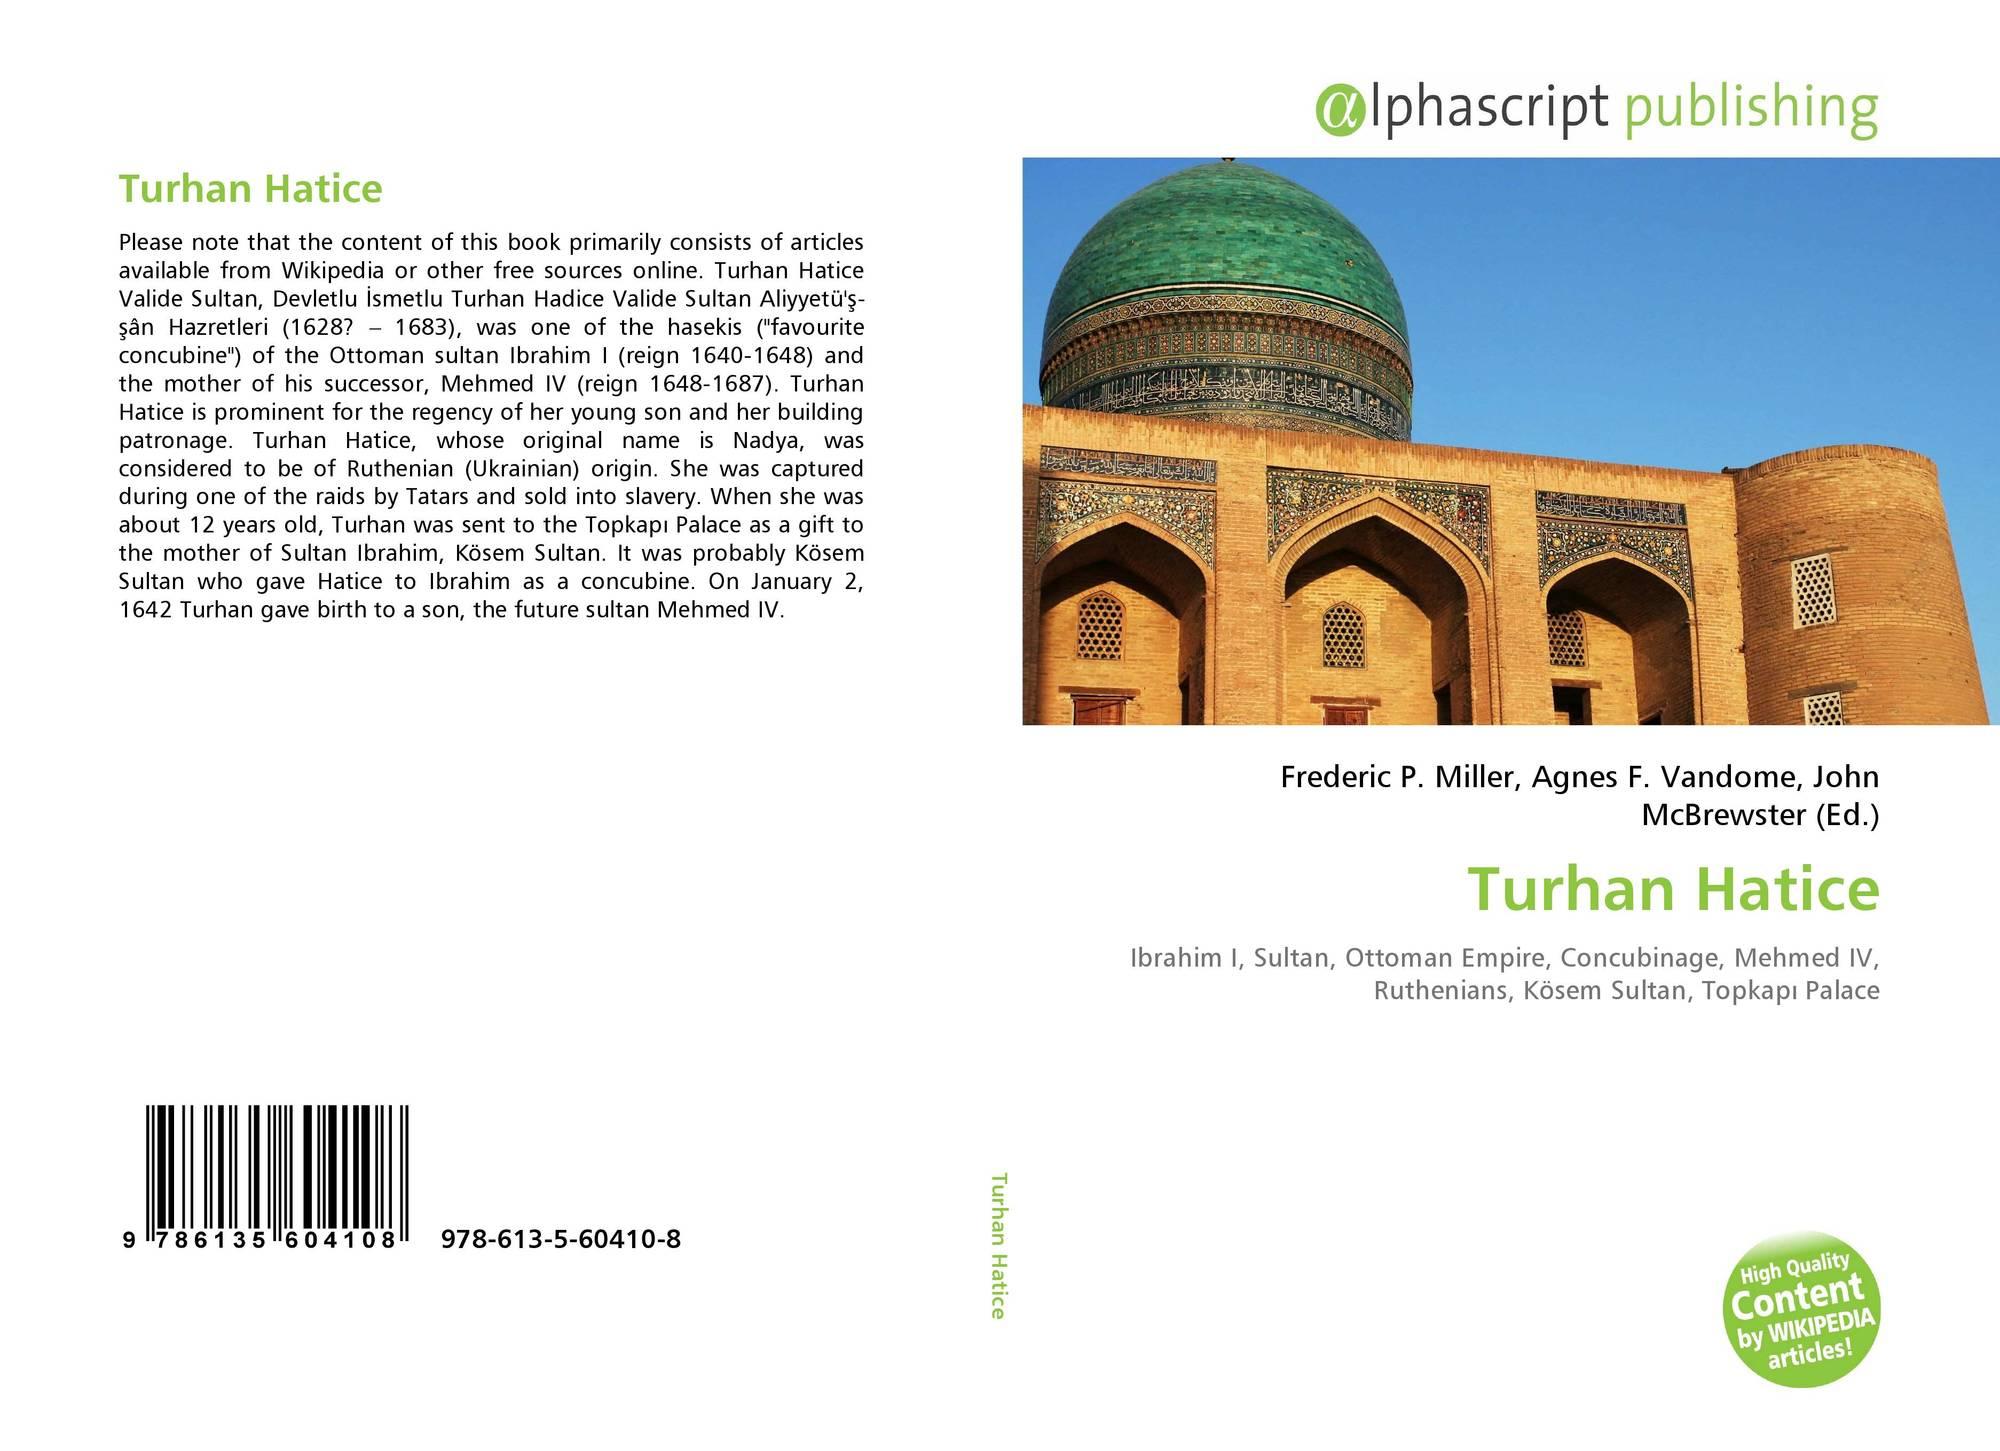 Turhan Hatice, 978-613-5-60410-8, 6135604104 ,9786135604108